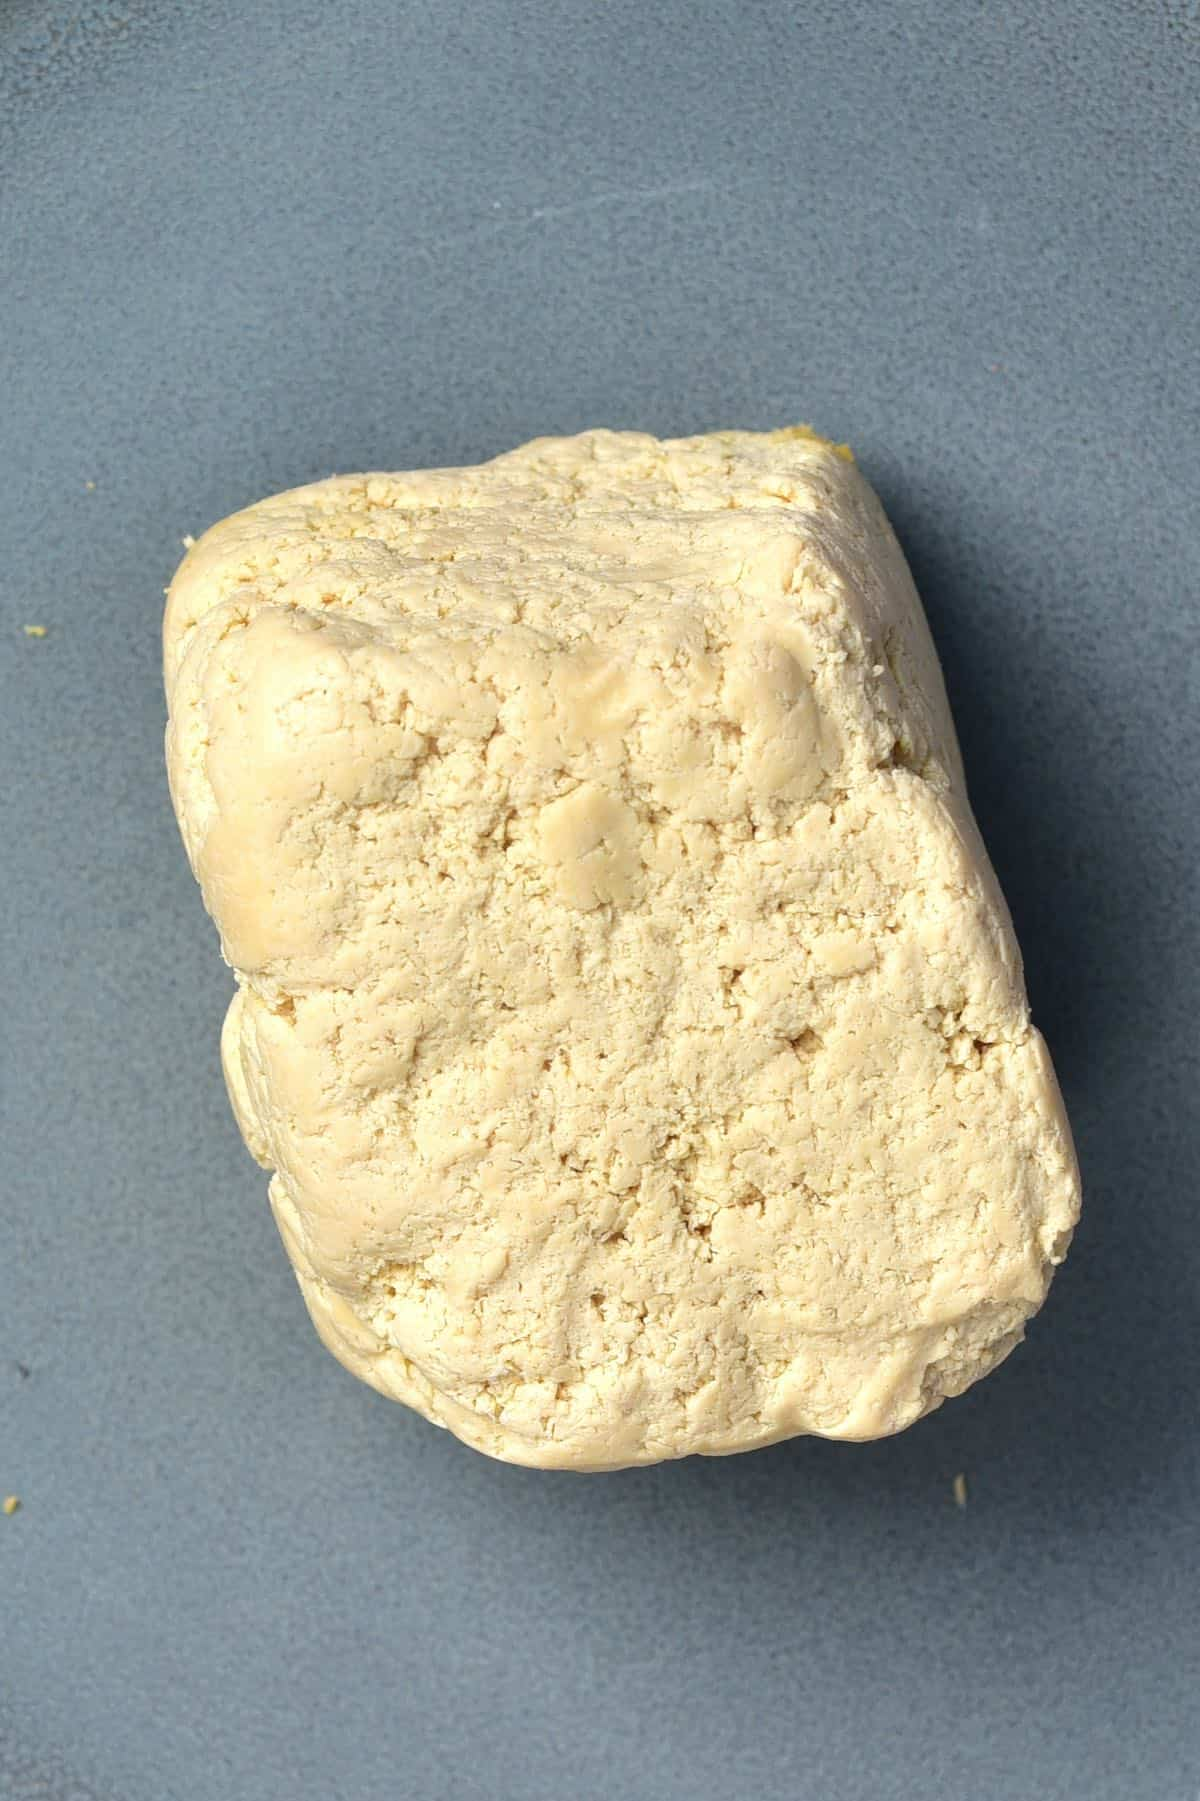 A block of firm tofu